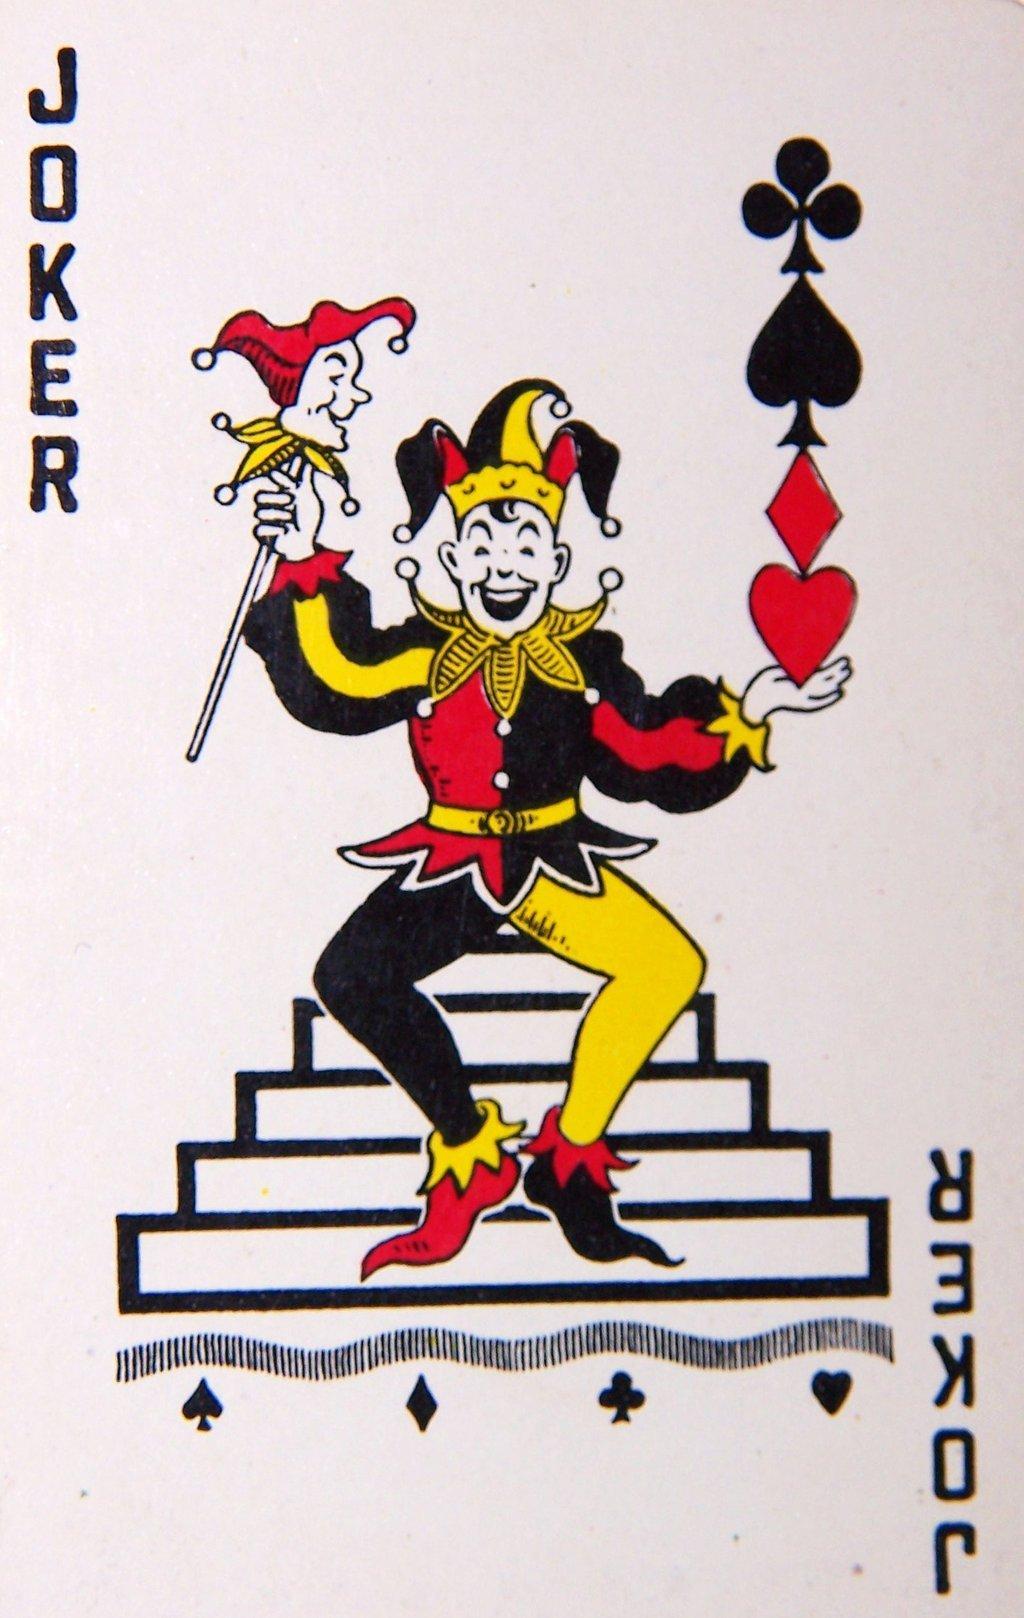 Free Joker Card, Download Free Clip Art, Free Clip Art on Clipart.